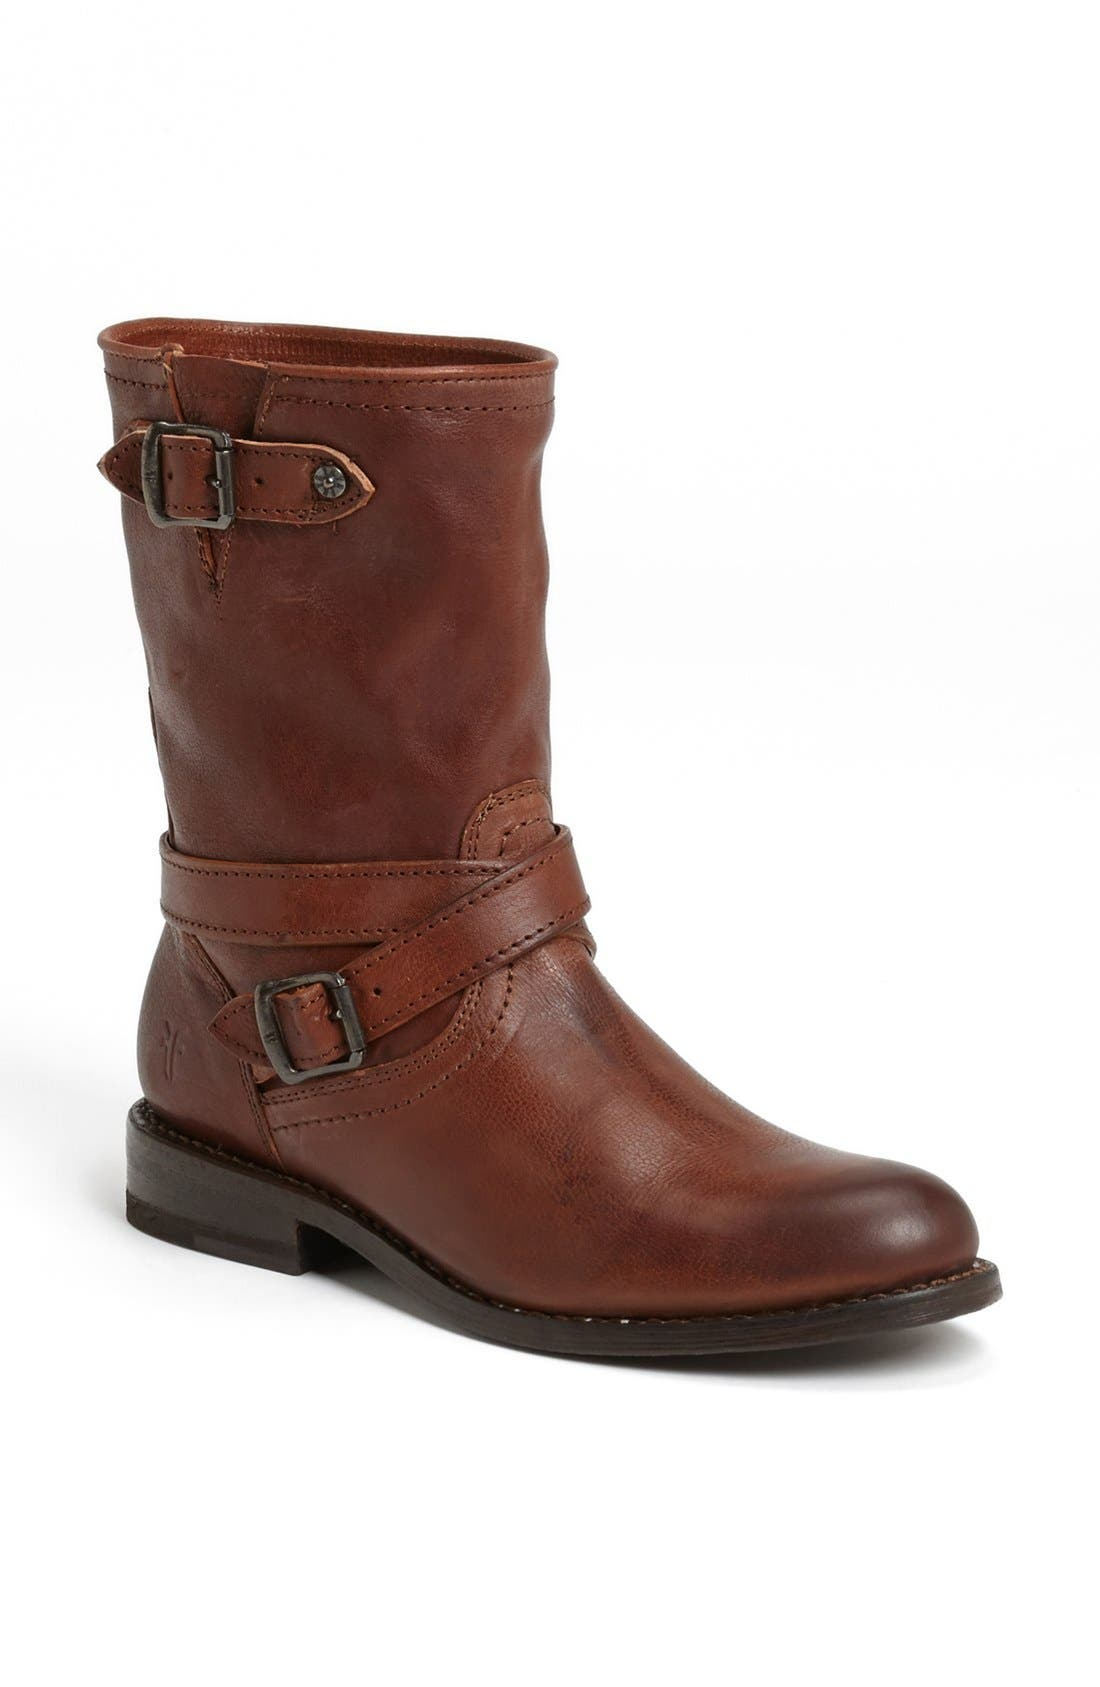 Alternate Image 1 Selected - Frye 'Jayden Cross Engineer' Leather Boot